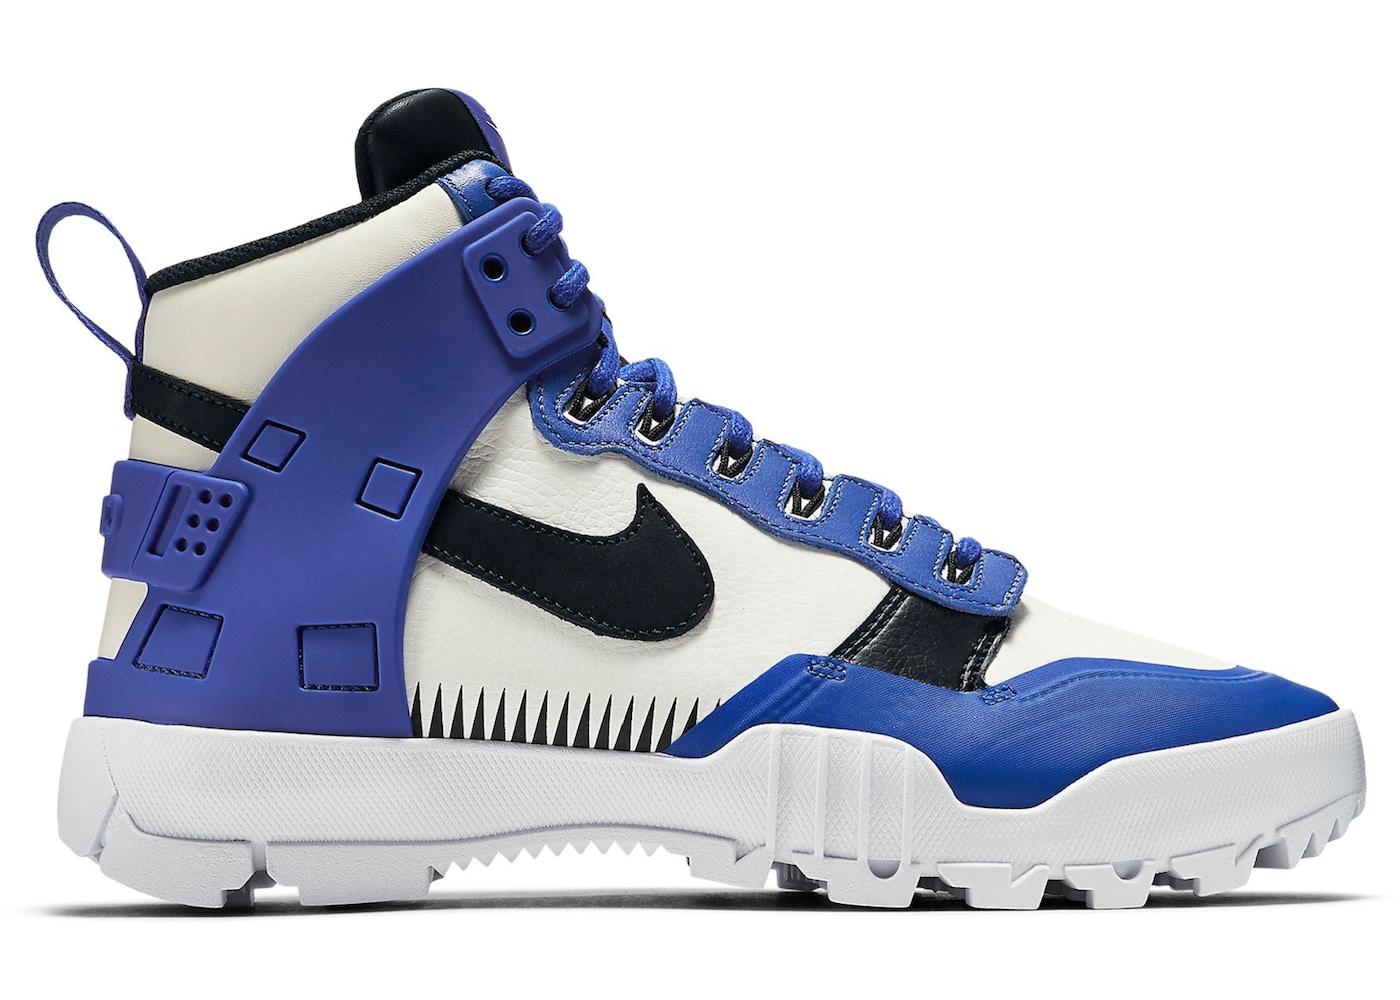 Nike SFB Jungle Dunk Undercover White - 910092-100 1cba3421d